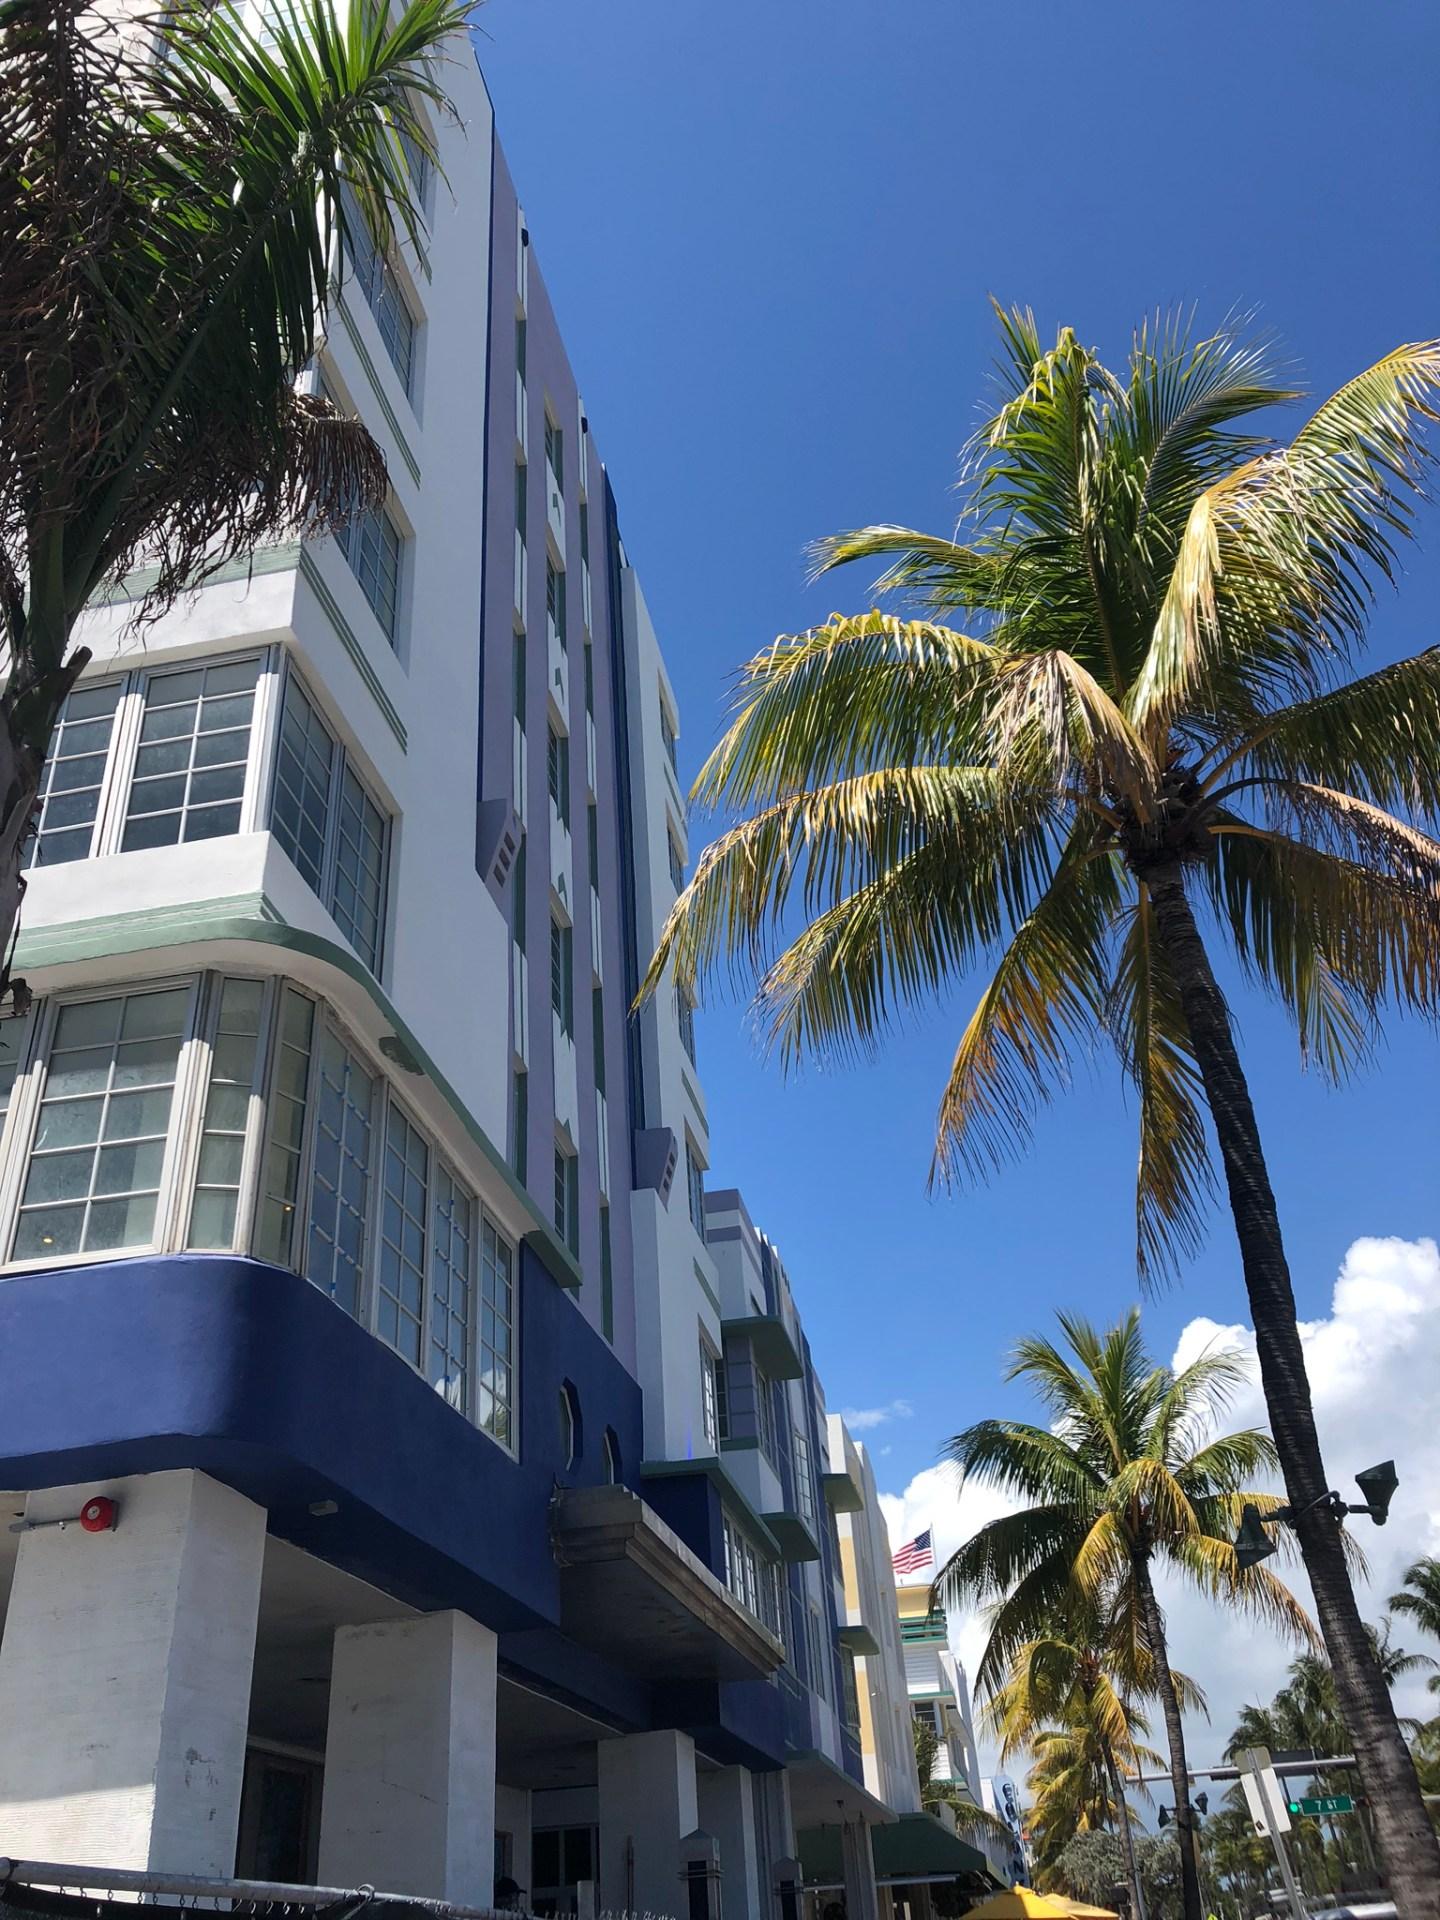 Art deco hotels on Ocean Drive